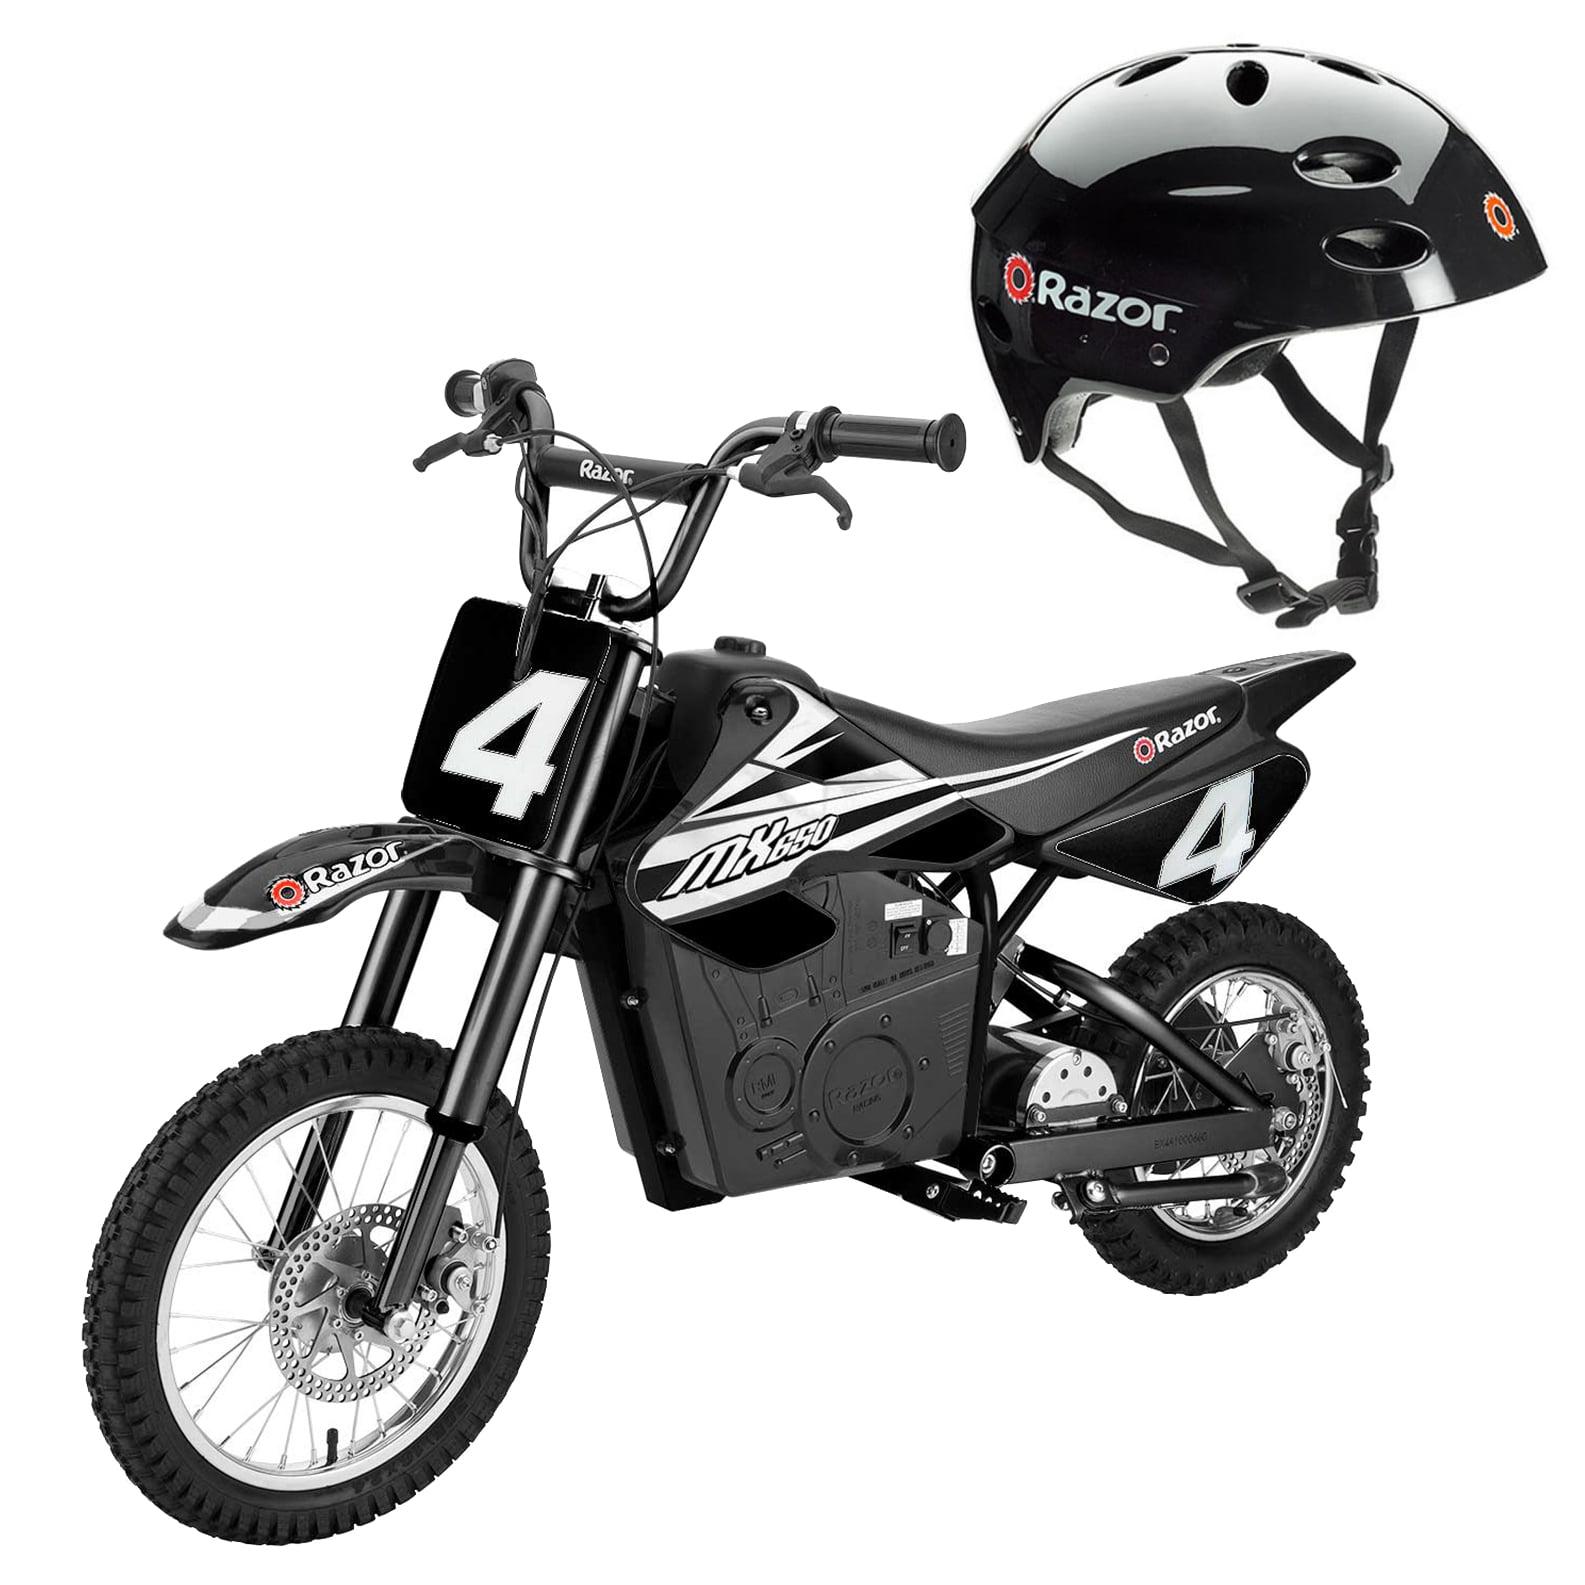 Razor MX650 Electric Dirt Rocket Motor Bike for Kids 12 & Up + V17 Youth Helmet by Razor